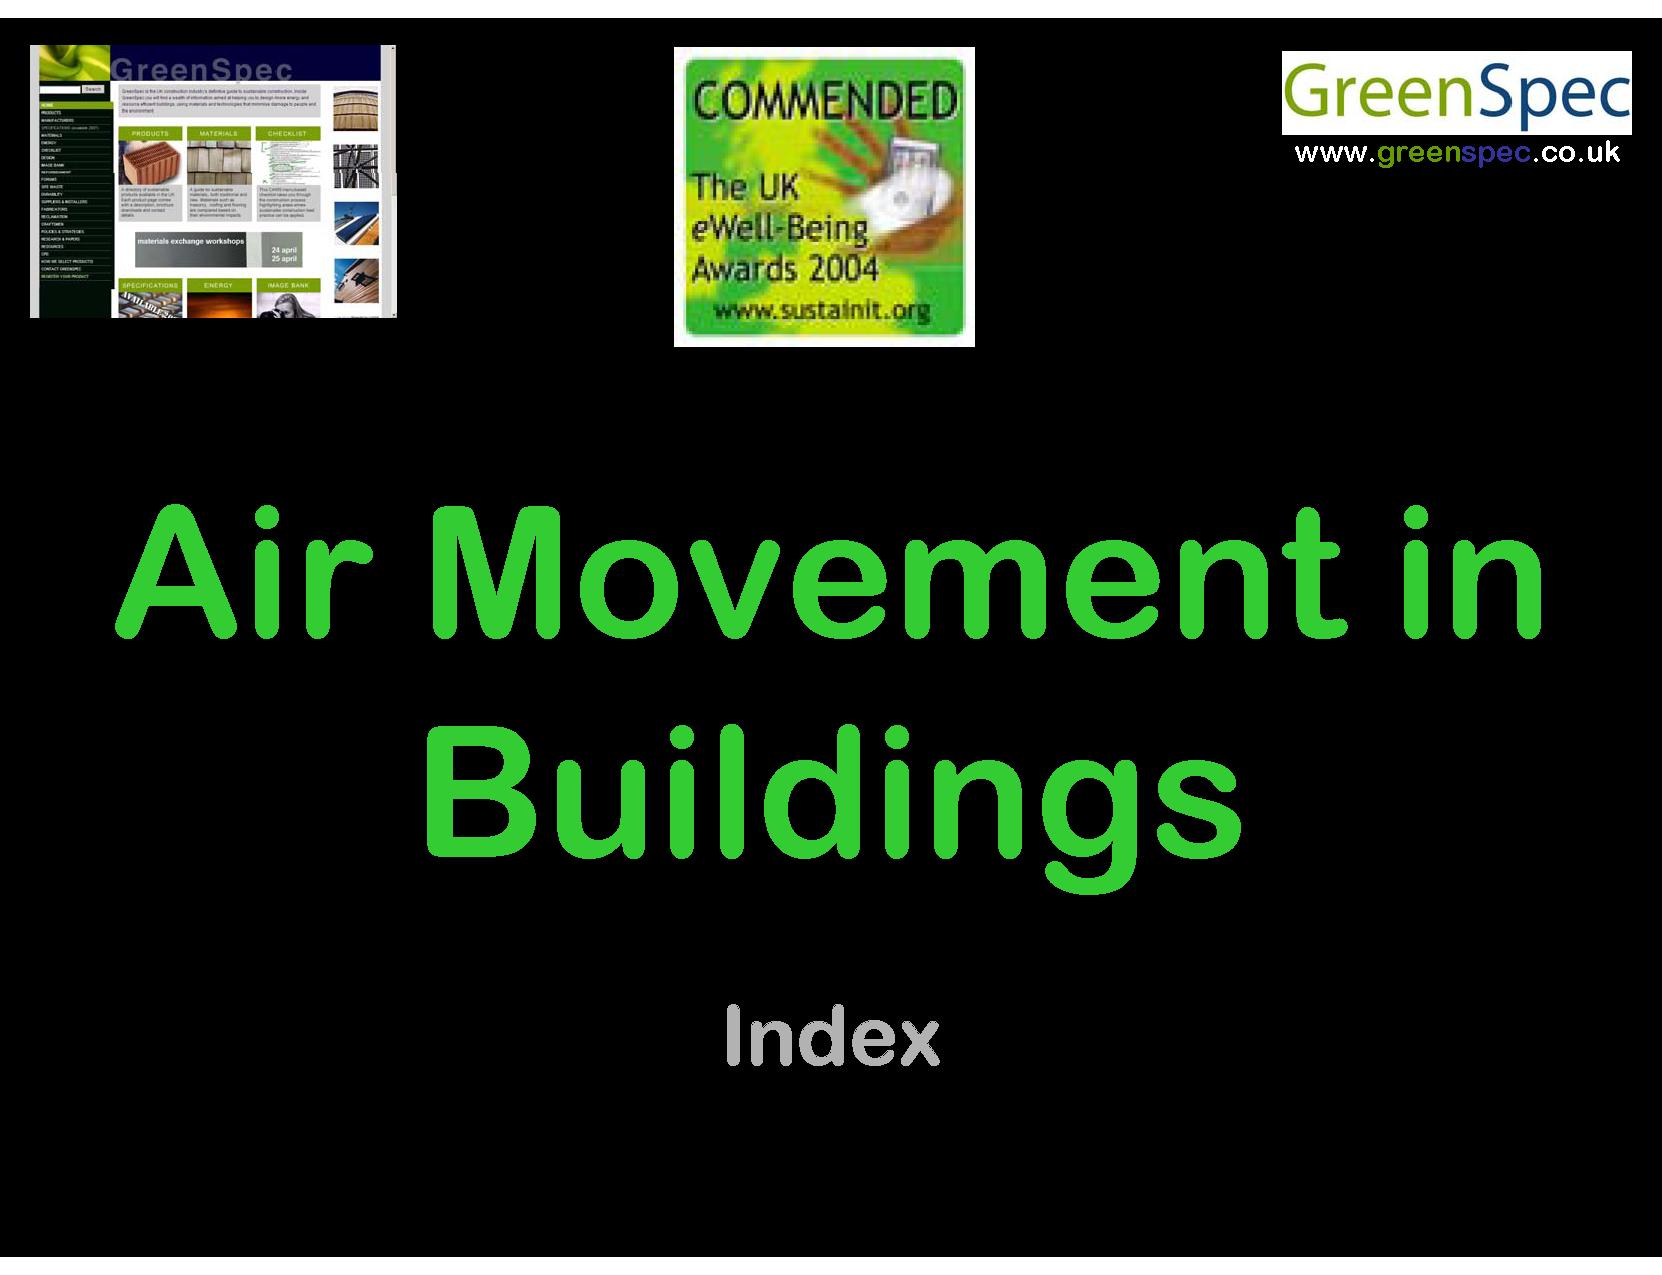 AirMovementInBuildings_Page_1